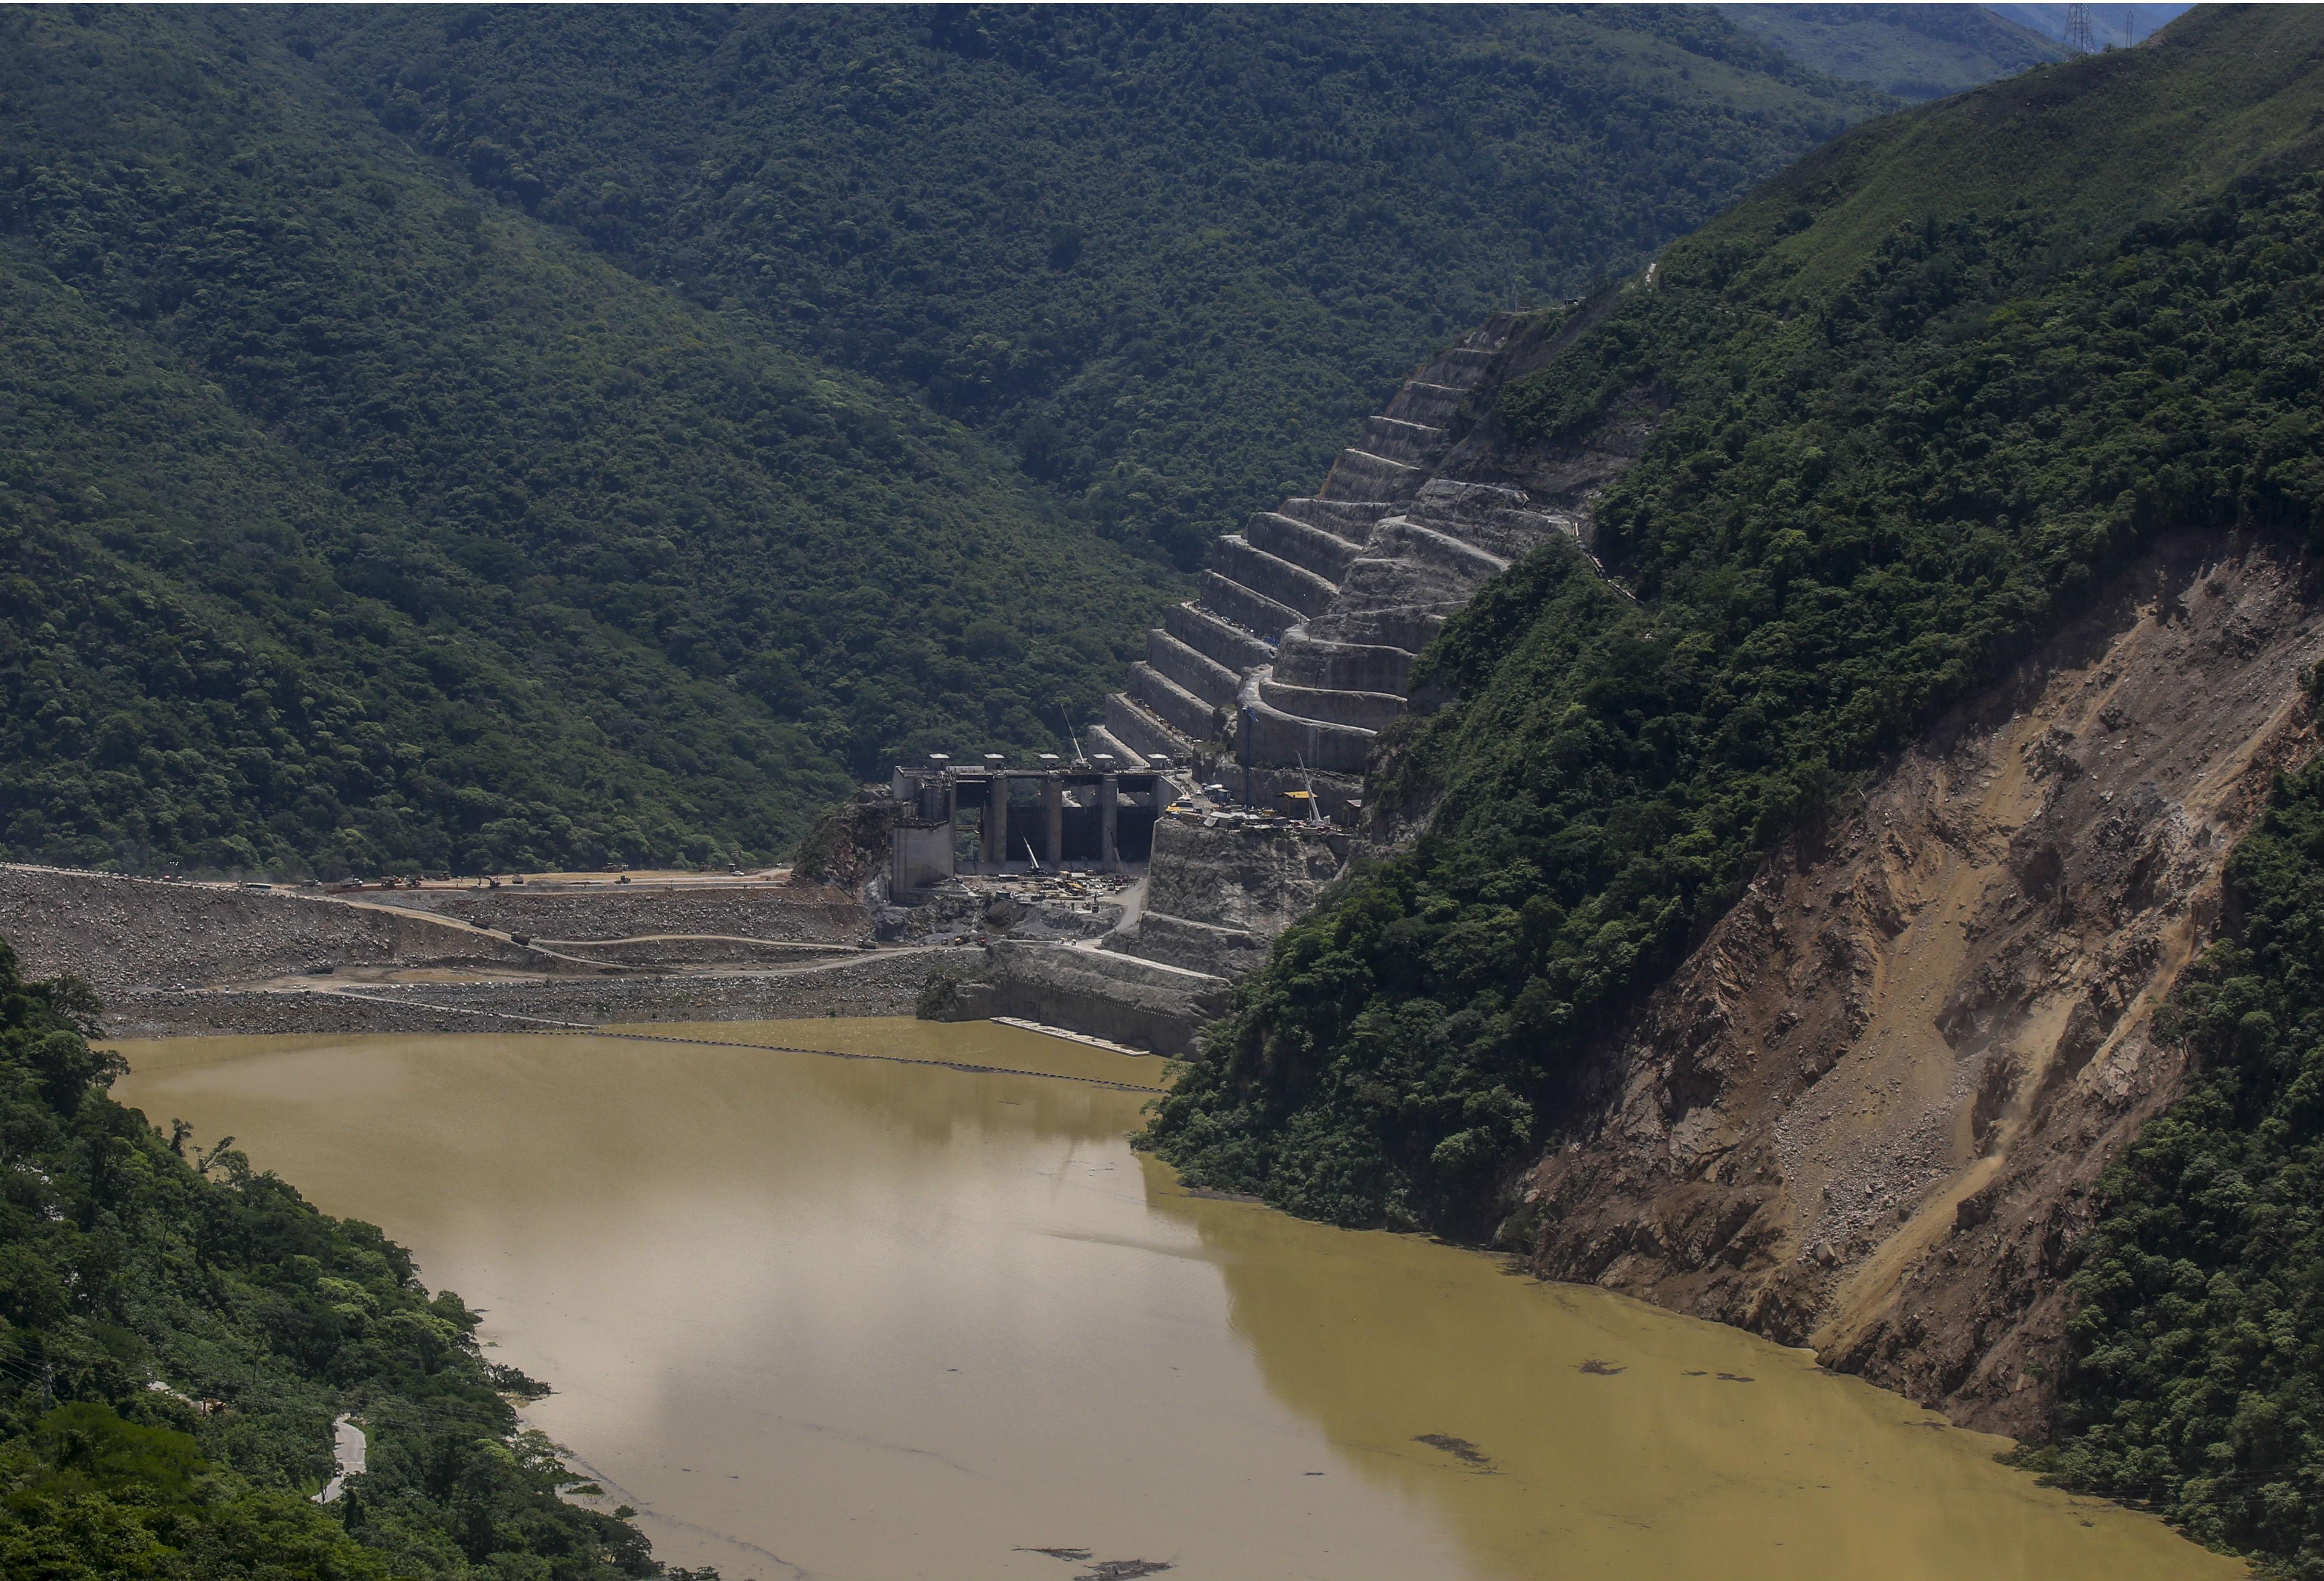 Reanudan trabajos en Hidroituango tras alerta roja | RCN Radio